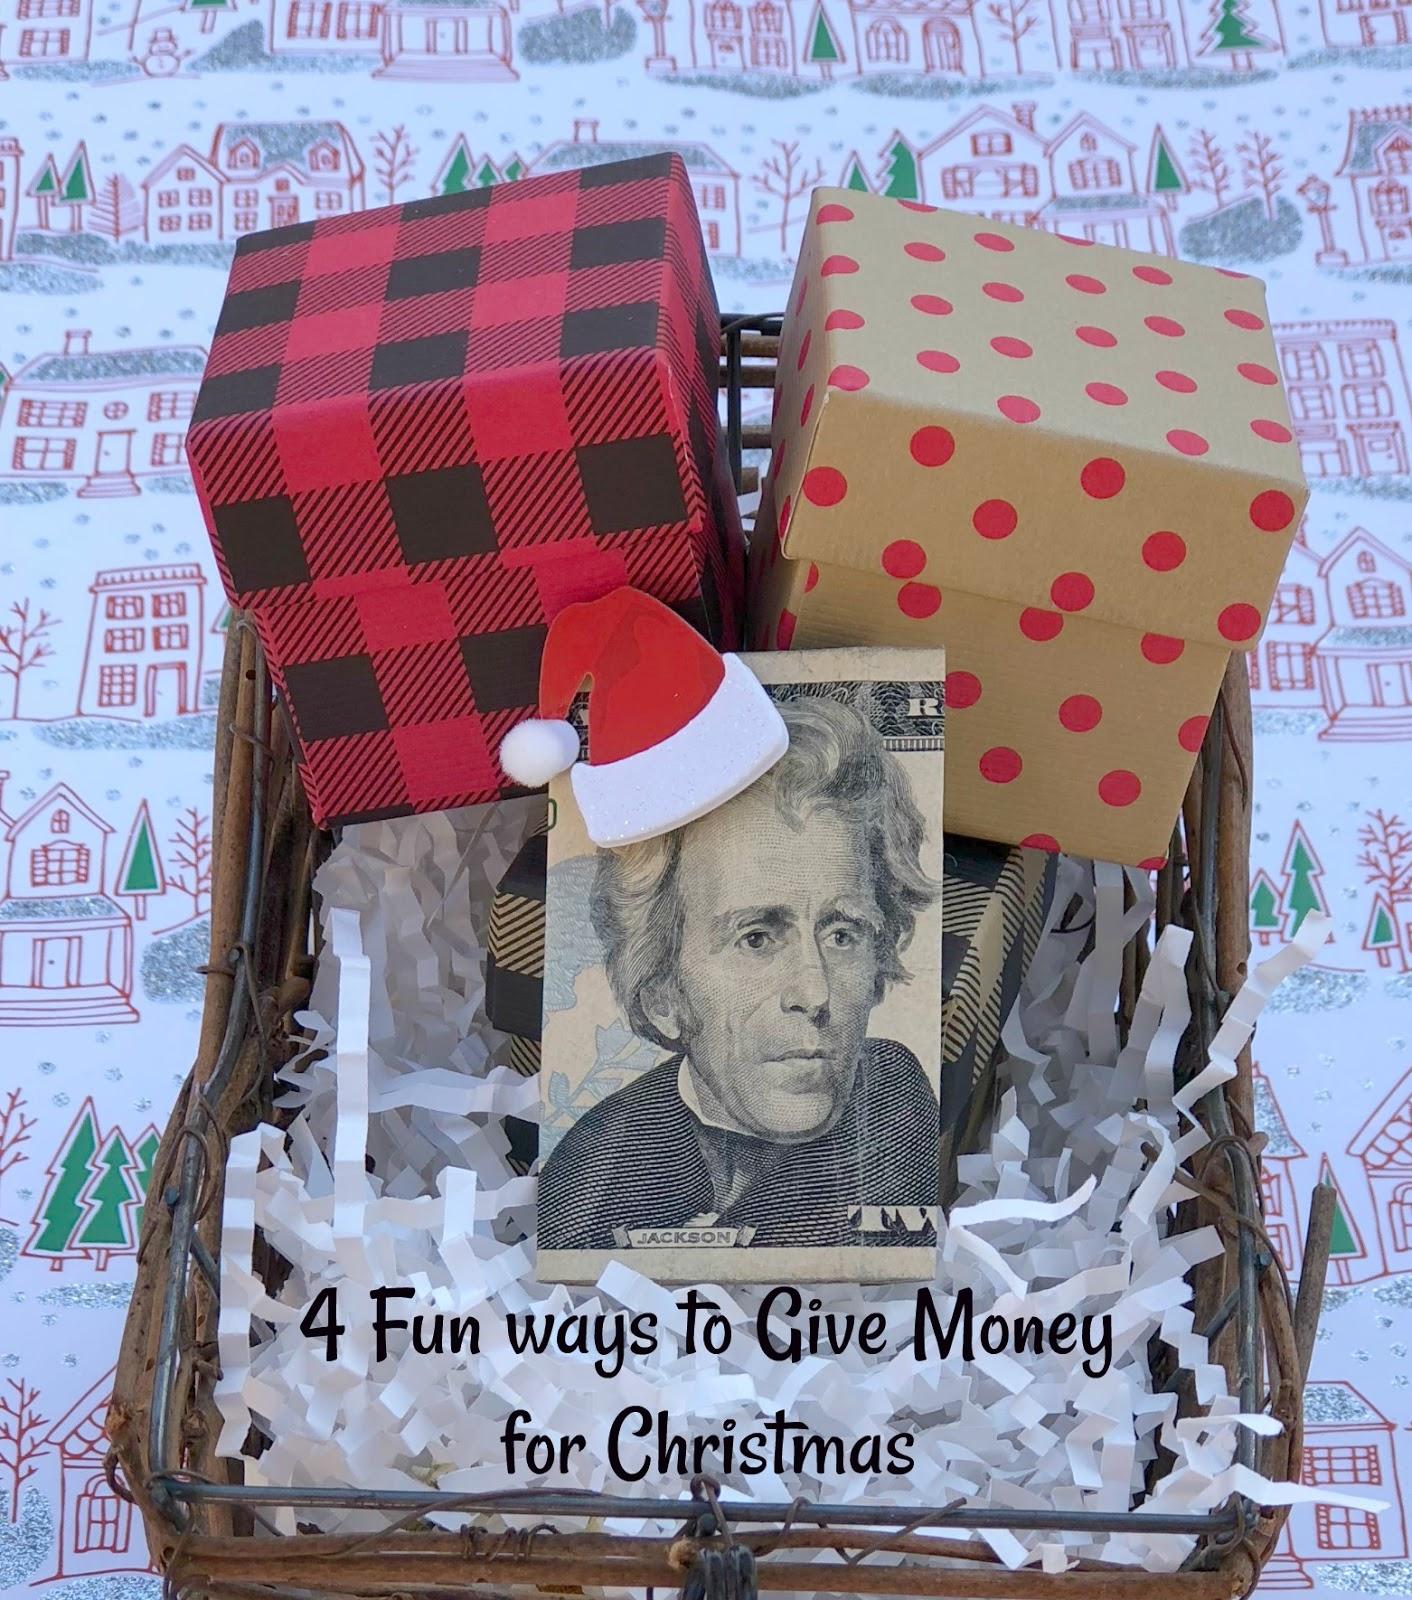 Jac o' lyn Murphy: 4 fun ways to give money for Christmas